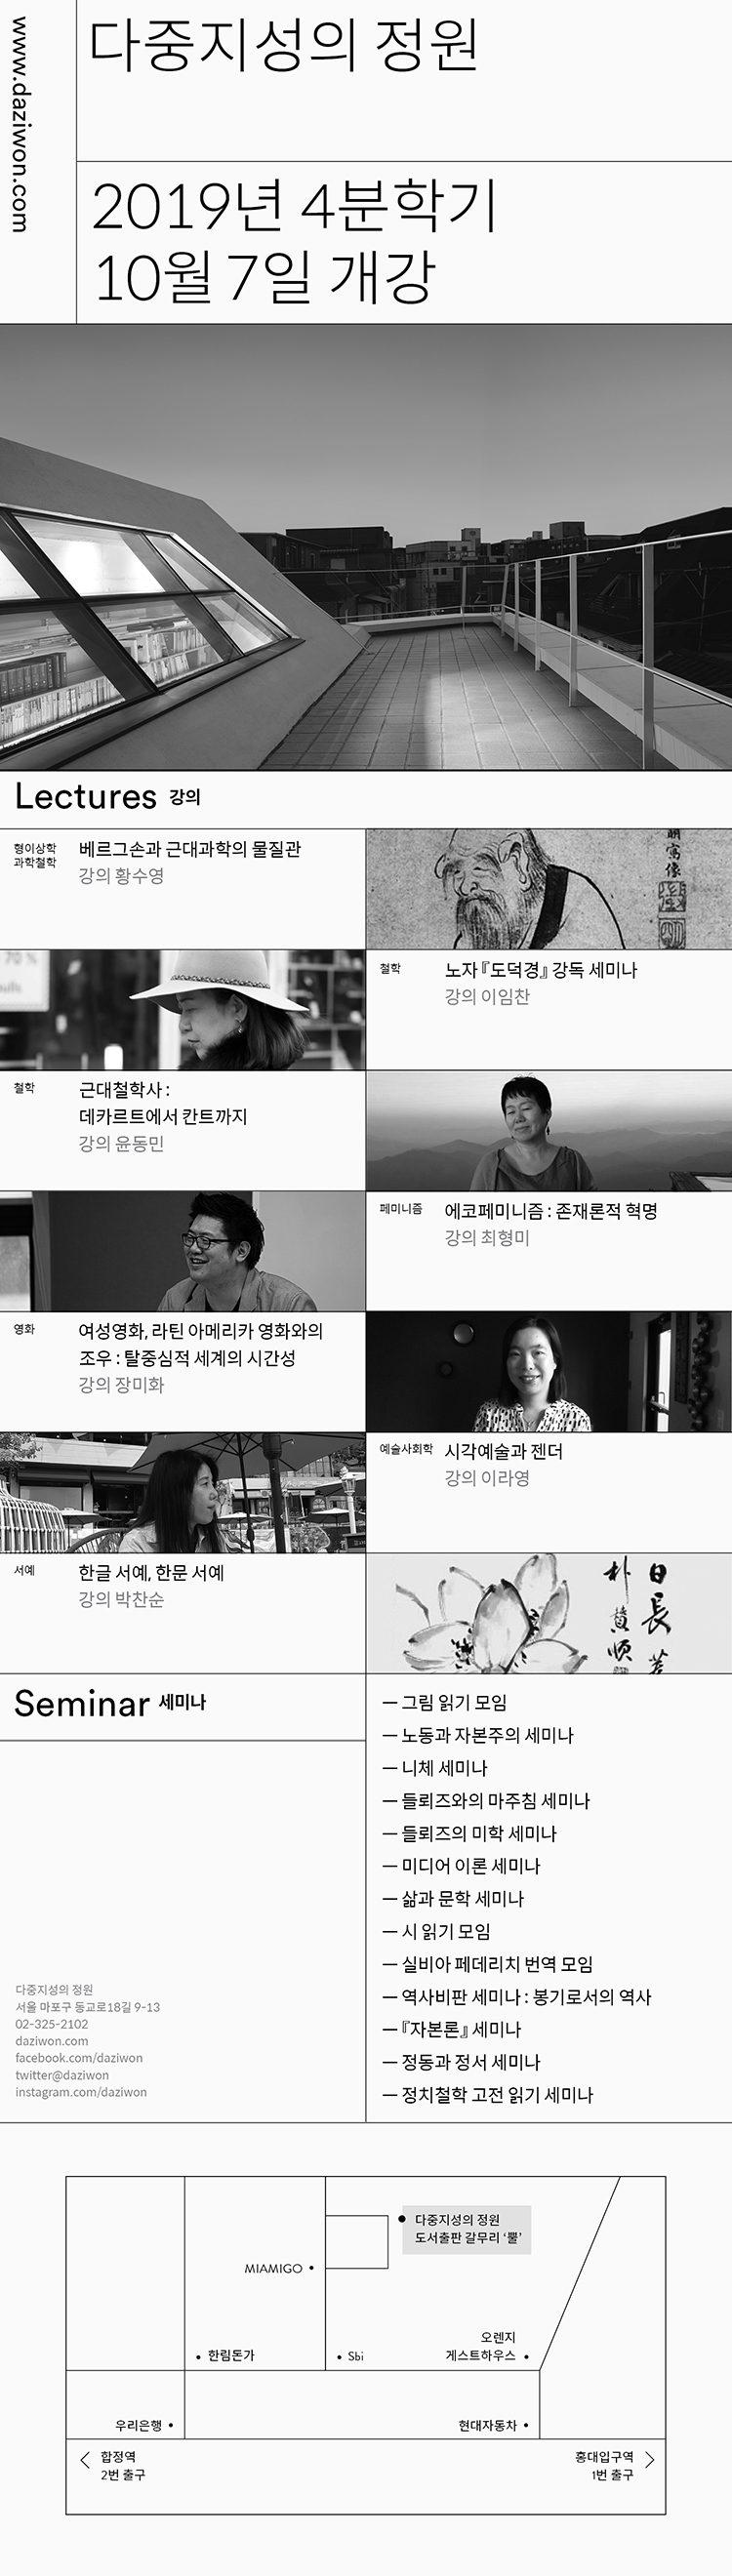 http://daziwon.com